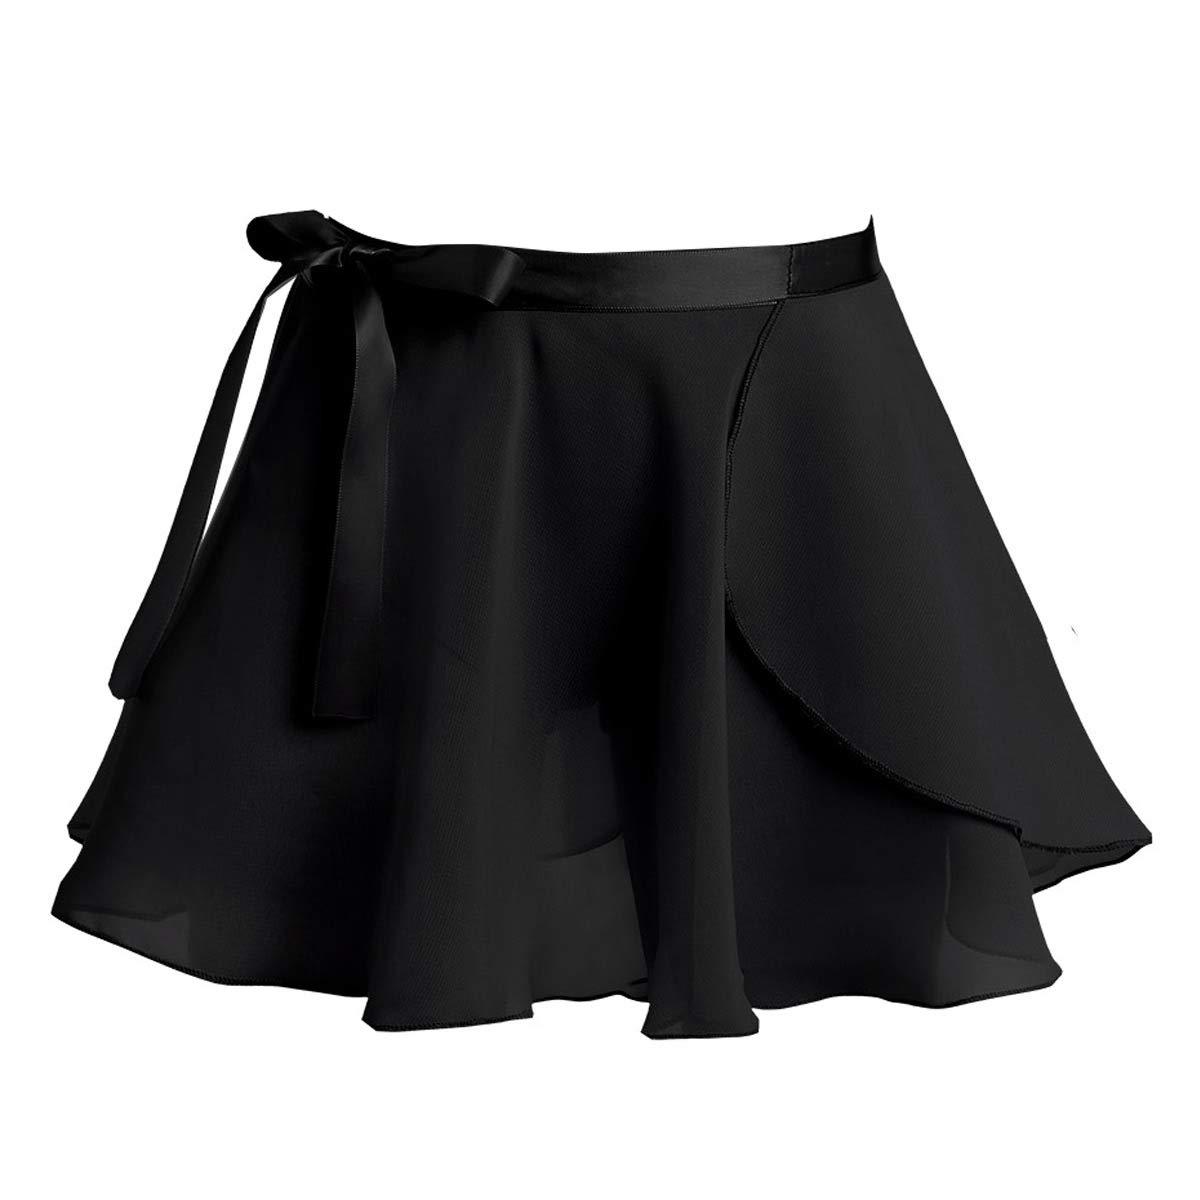 TiaoBug Girls' Ballet Wrap Skirt with Tie Waist Chiffon Basic Wrap Tutu Dancewear Costumes Black 5-6